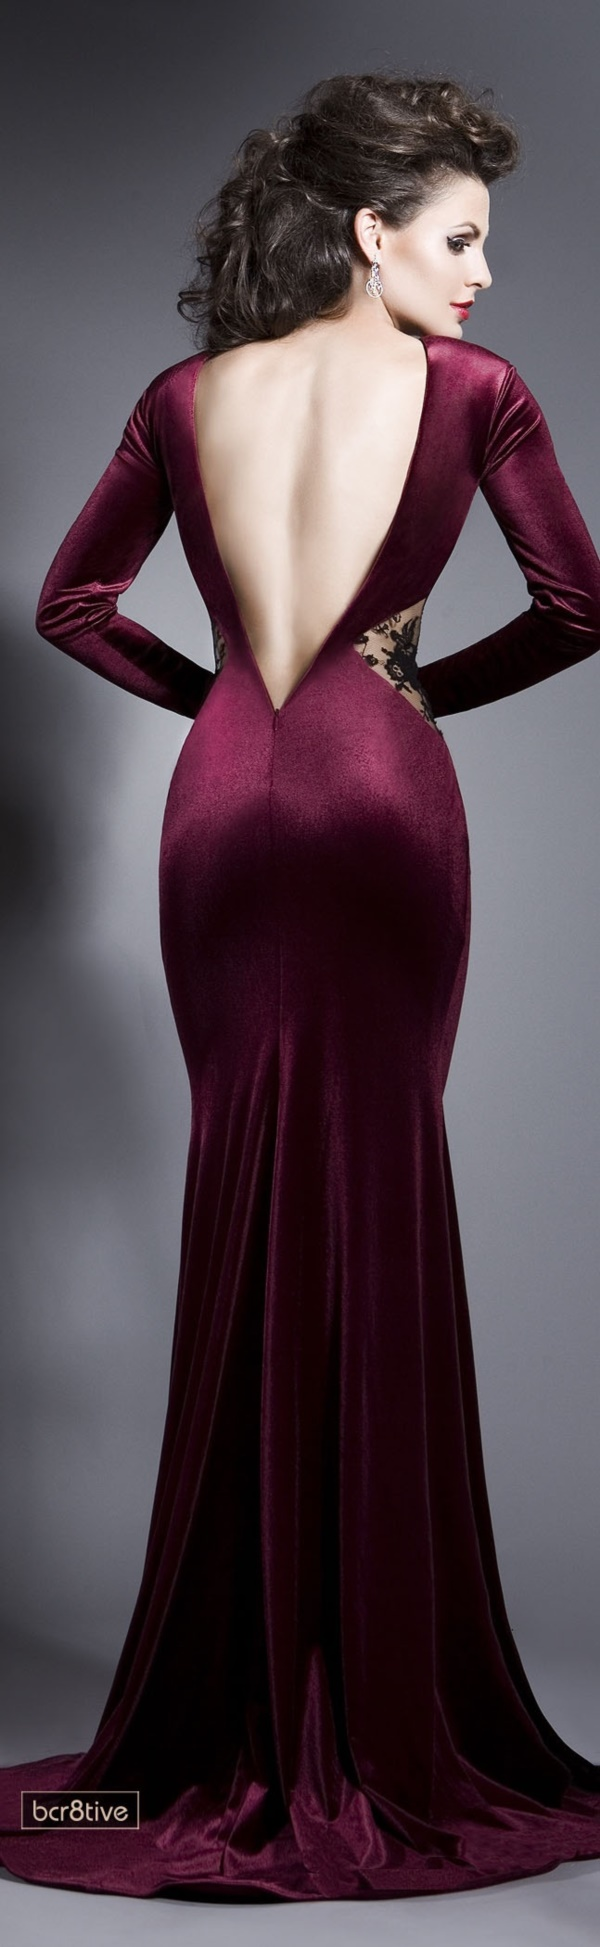 Purple Backless Dresses